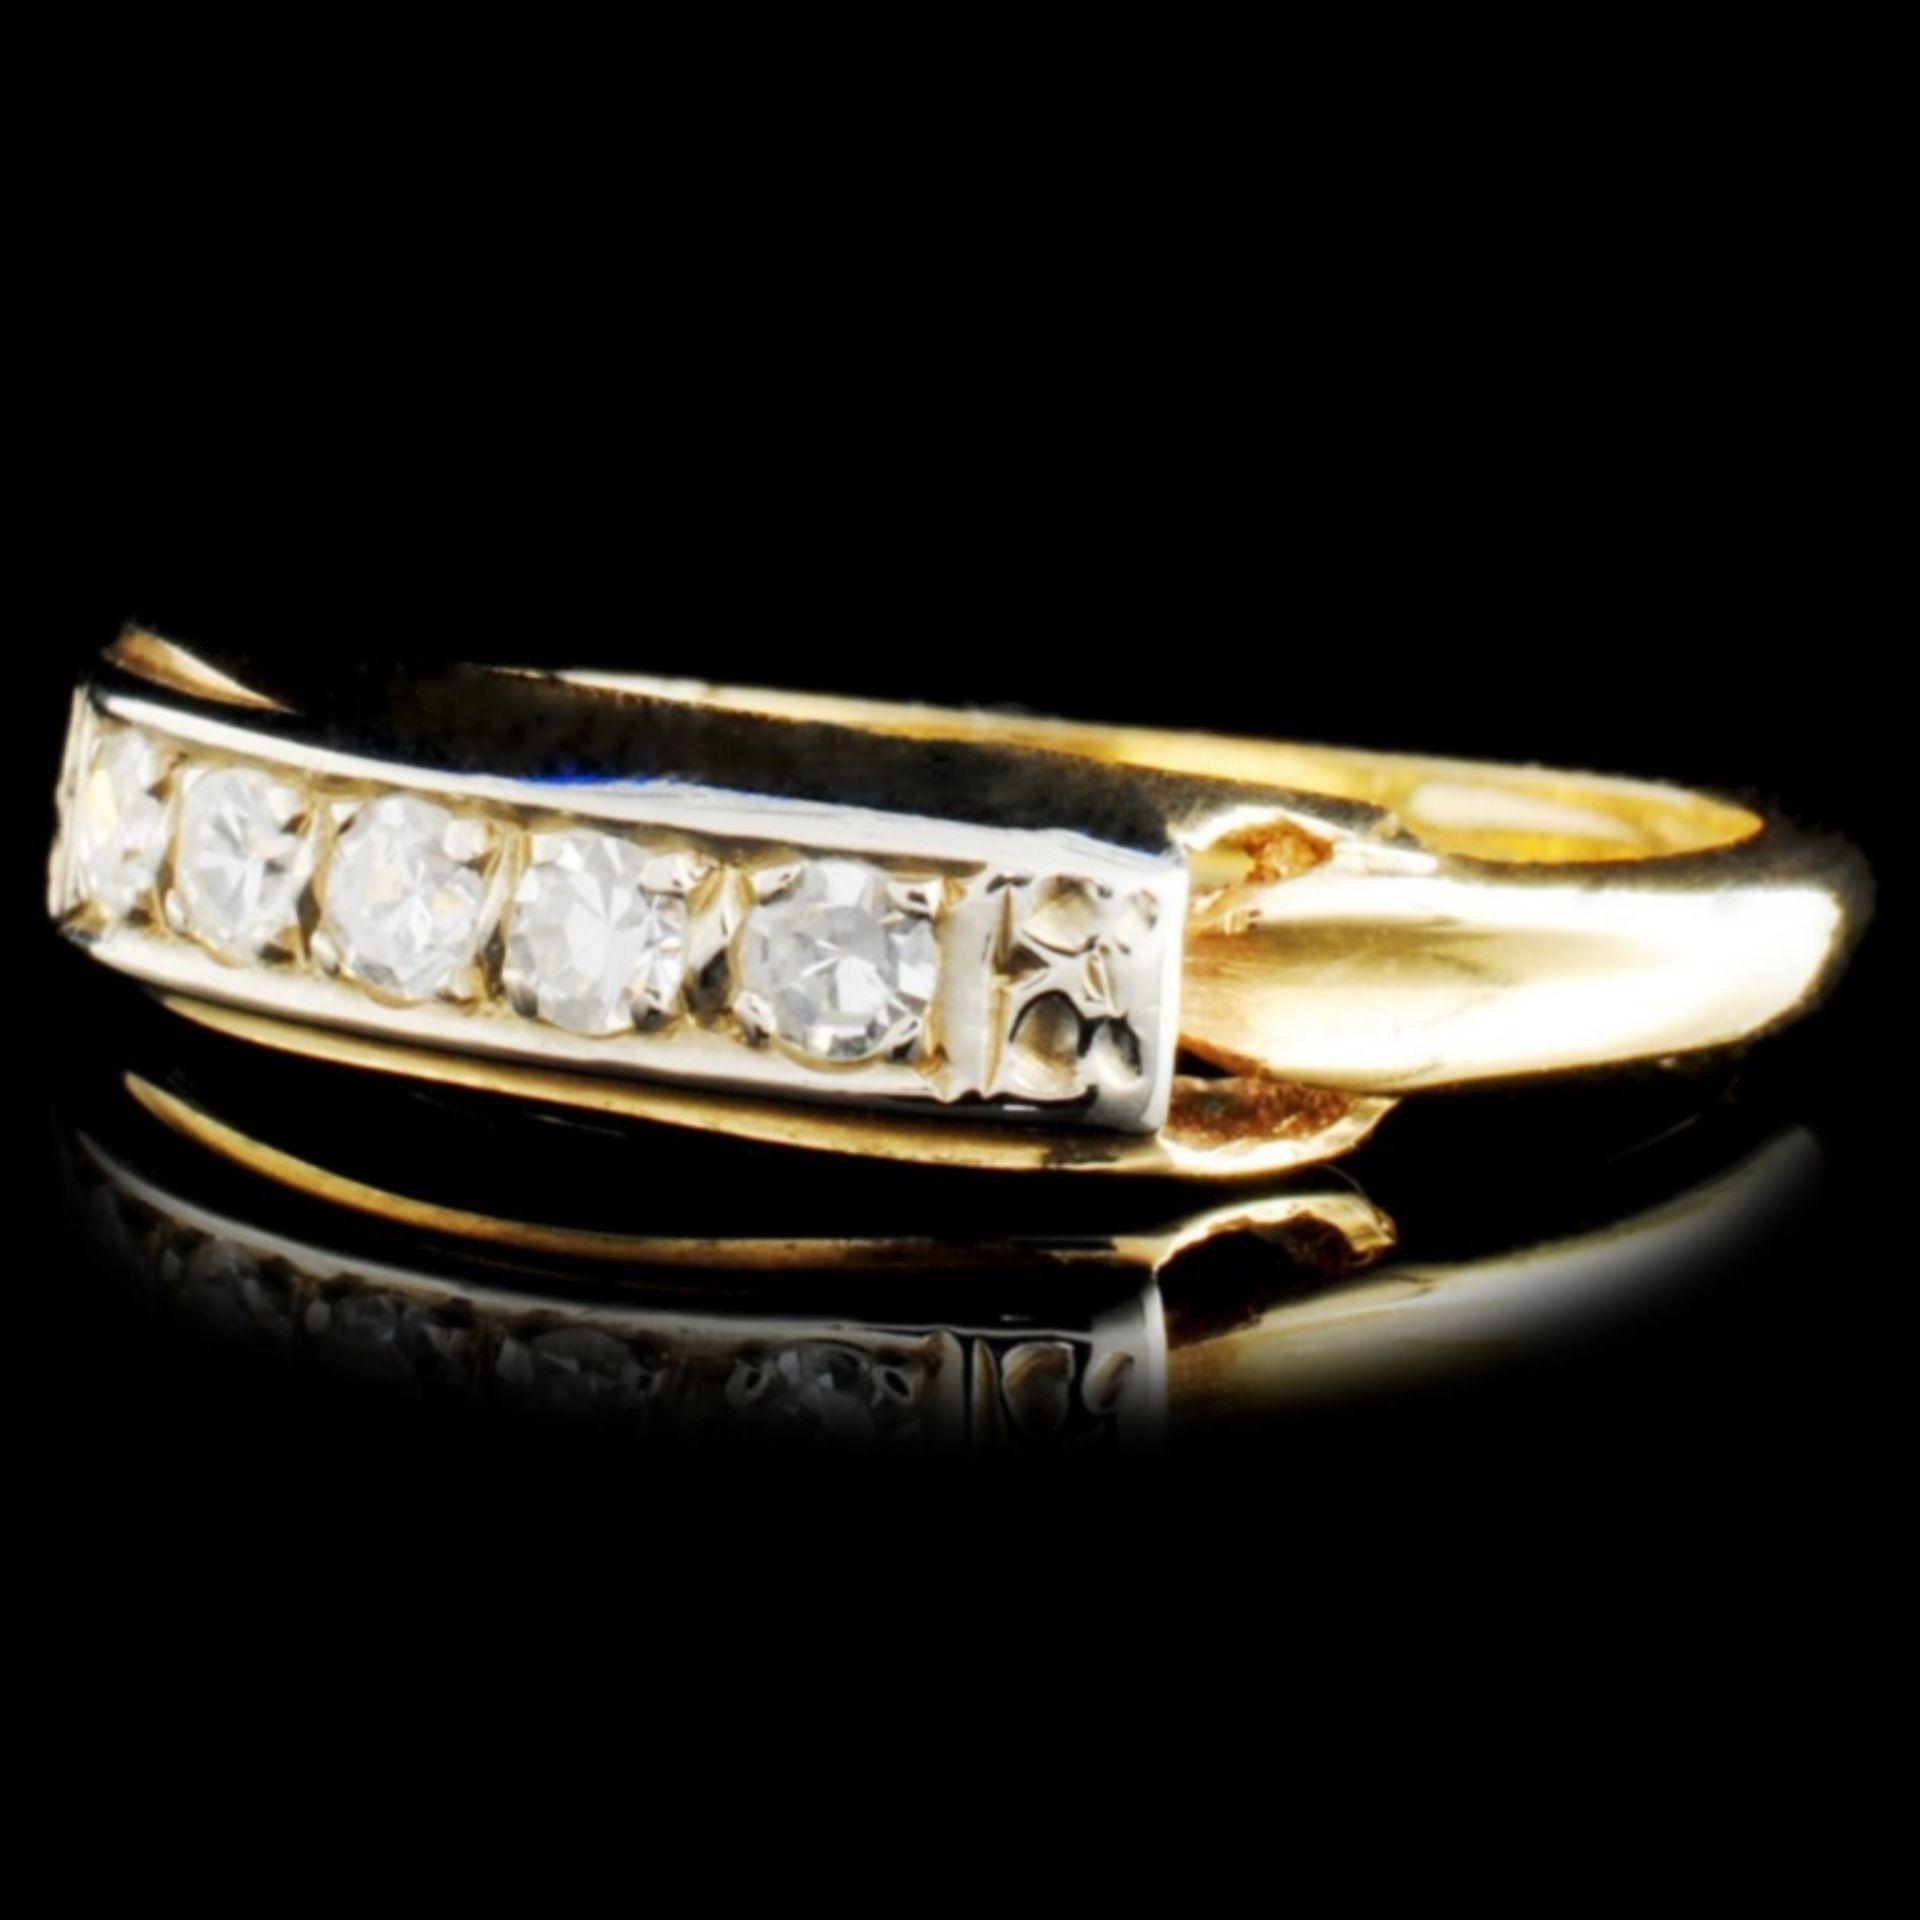 14K Gold 0.23ctw Diamond Ring - Image 2 of 2